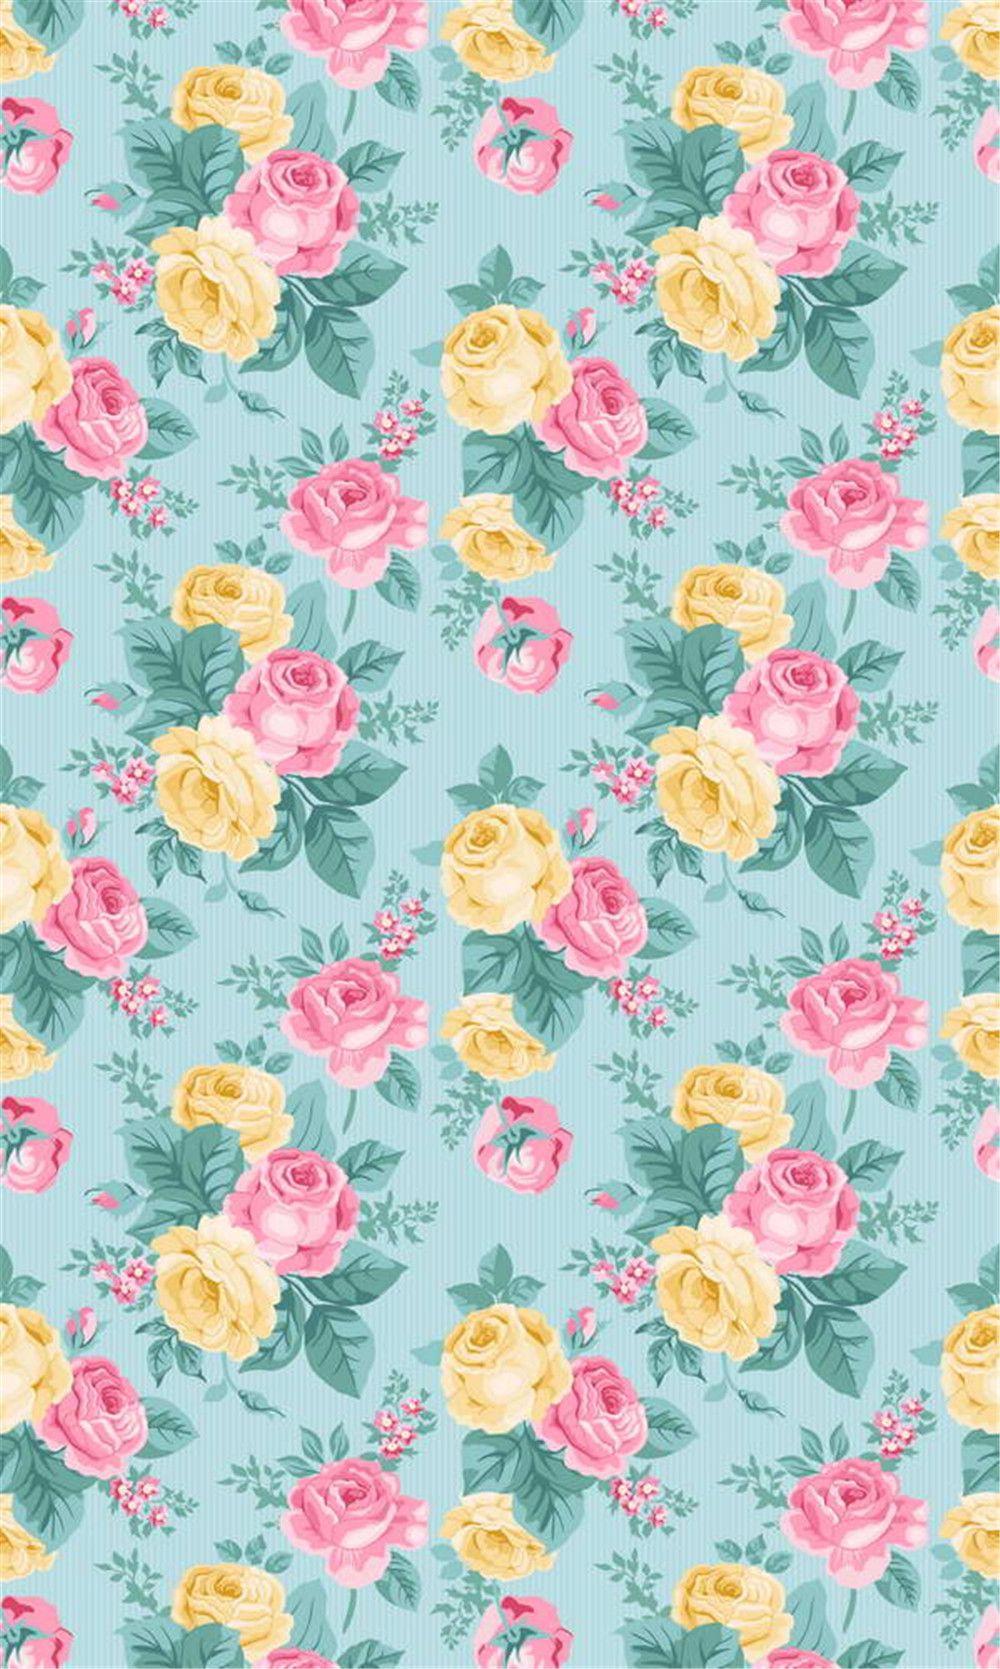 2019 Digital Printing Pink Yellow Roses Damask Photo Shoot ...